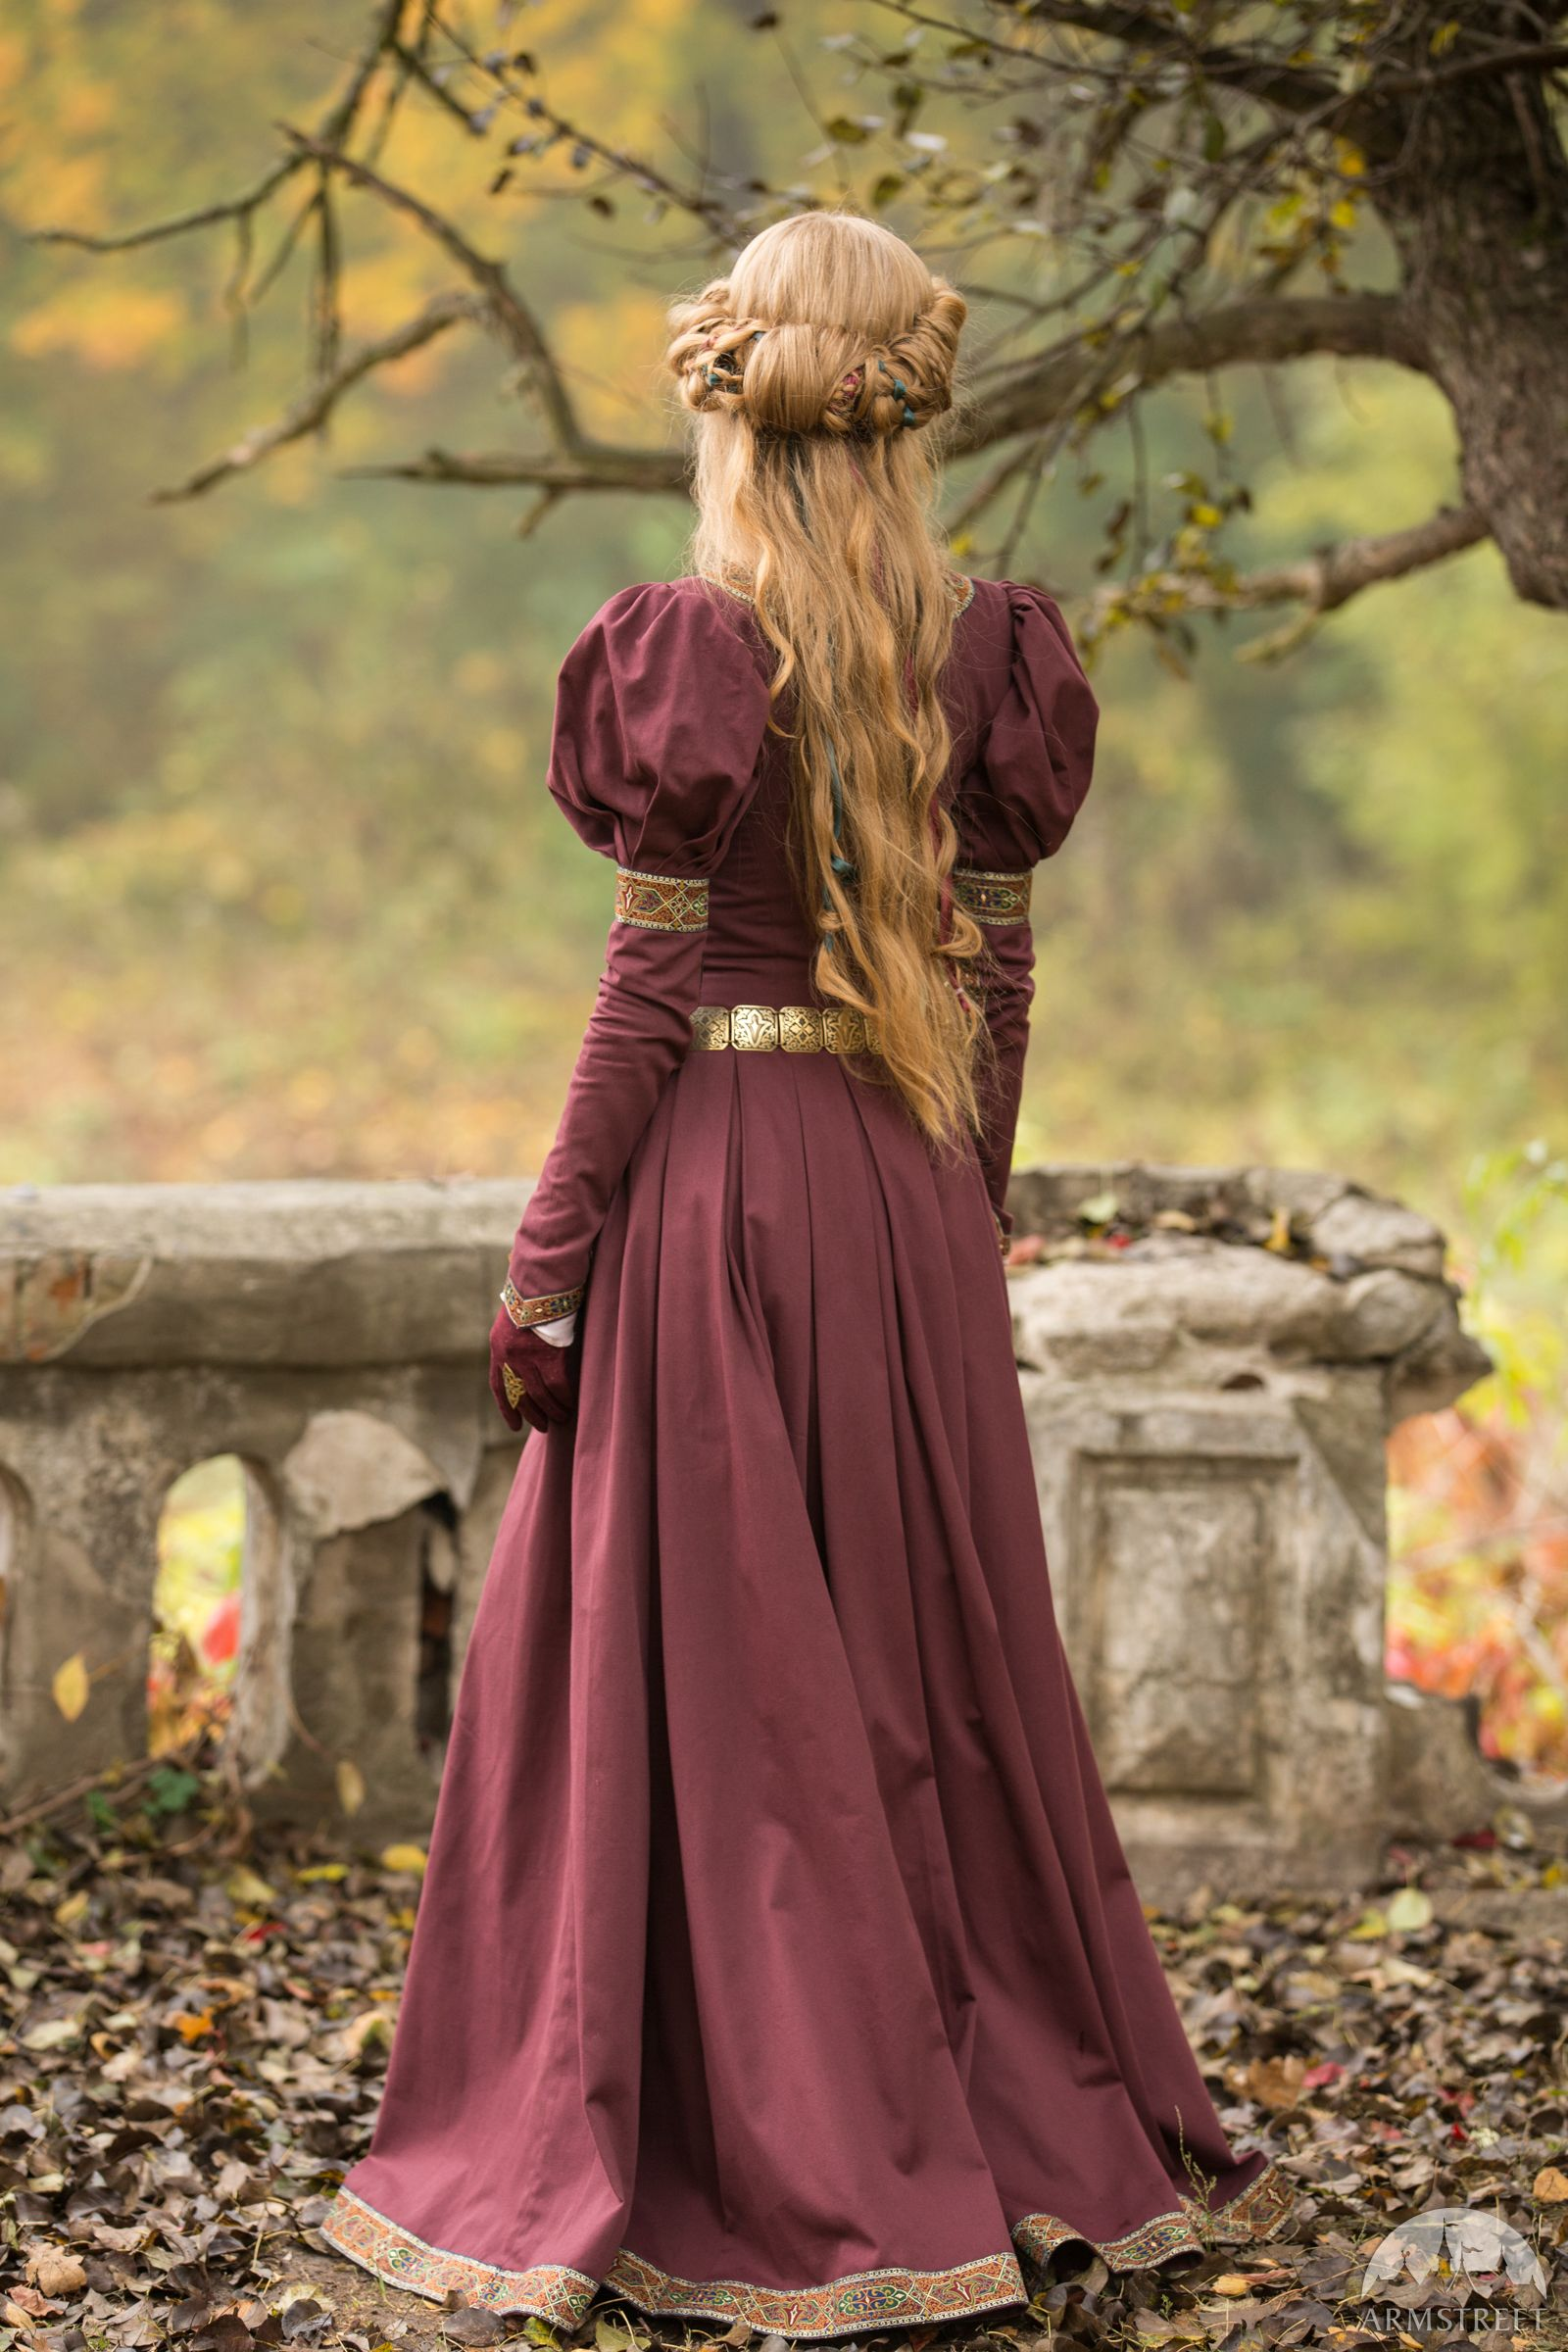 Robe style médiéval « Princesse Perdue » en 2019 Robe